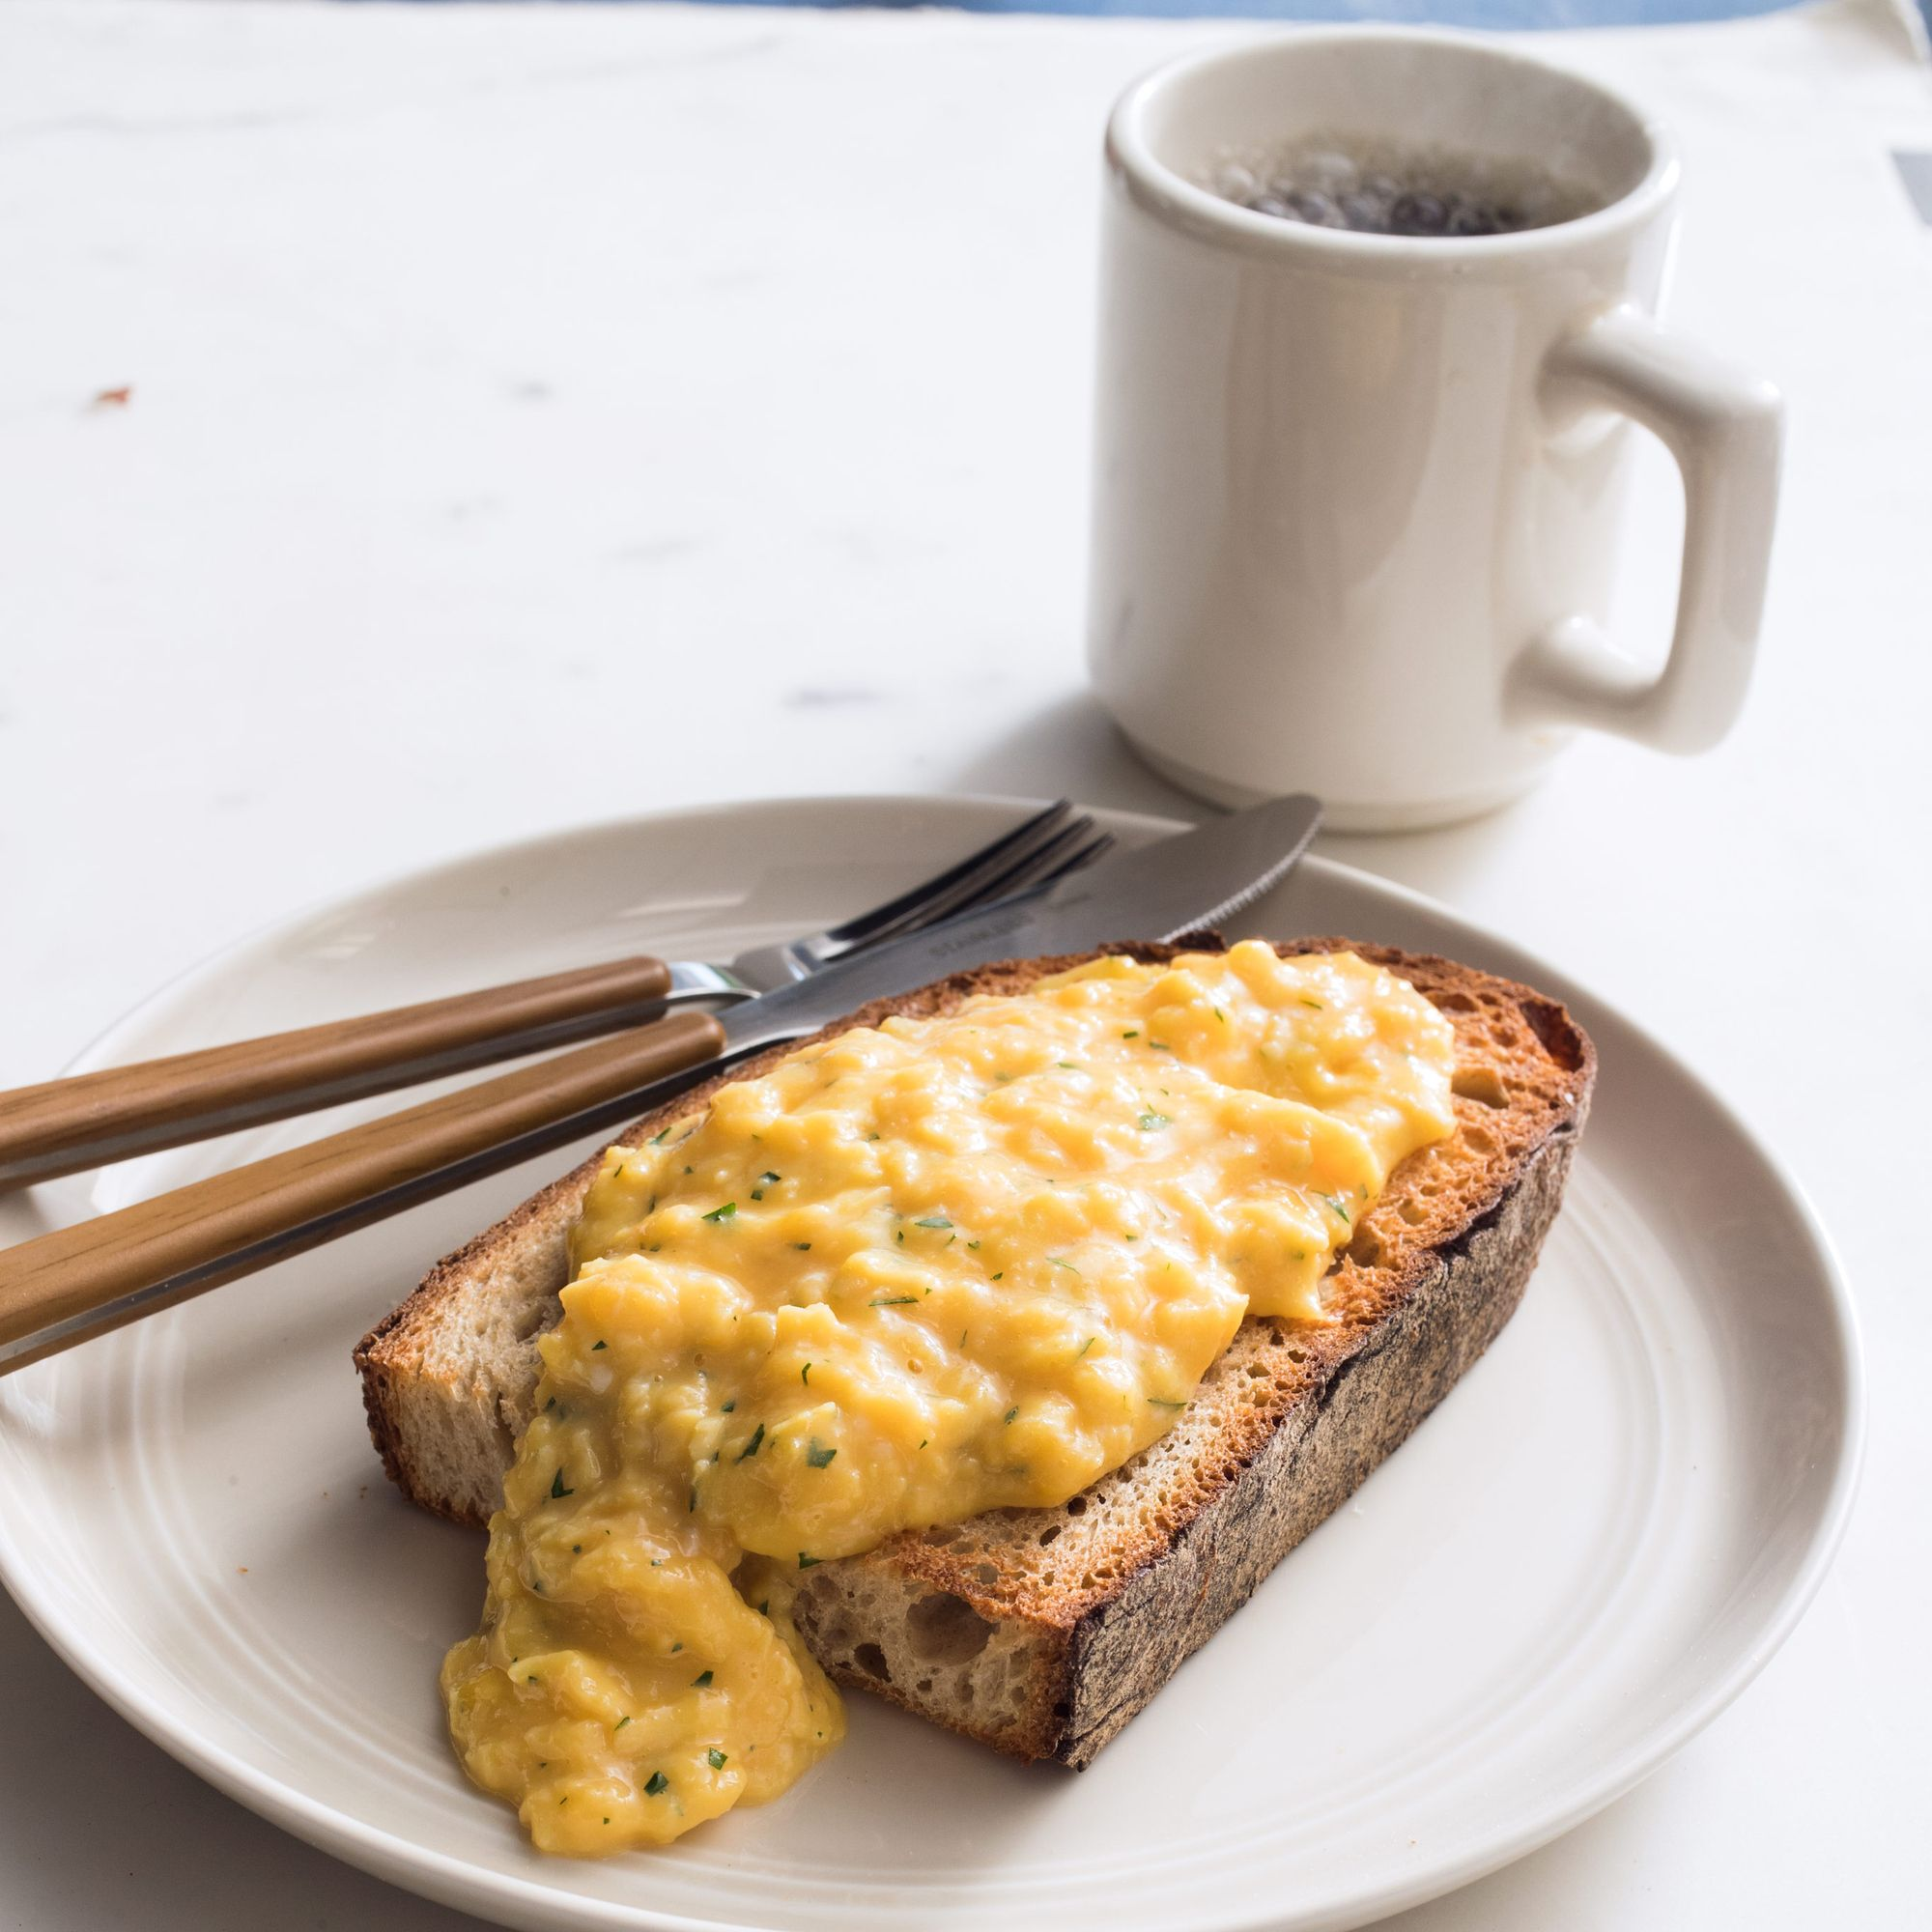 Country Style Scrambled Eggs Recipe: Creamy French-Style Scrambled Eggs. For Incredibly Lush